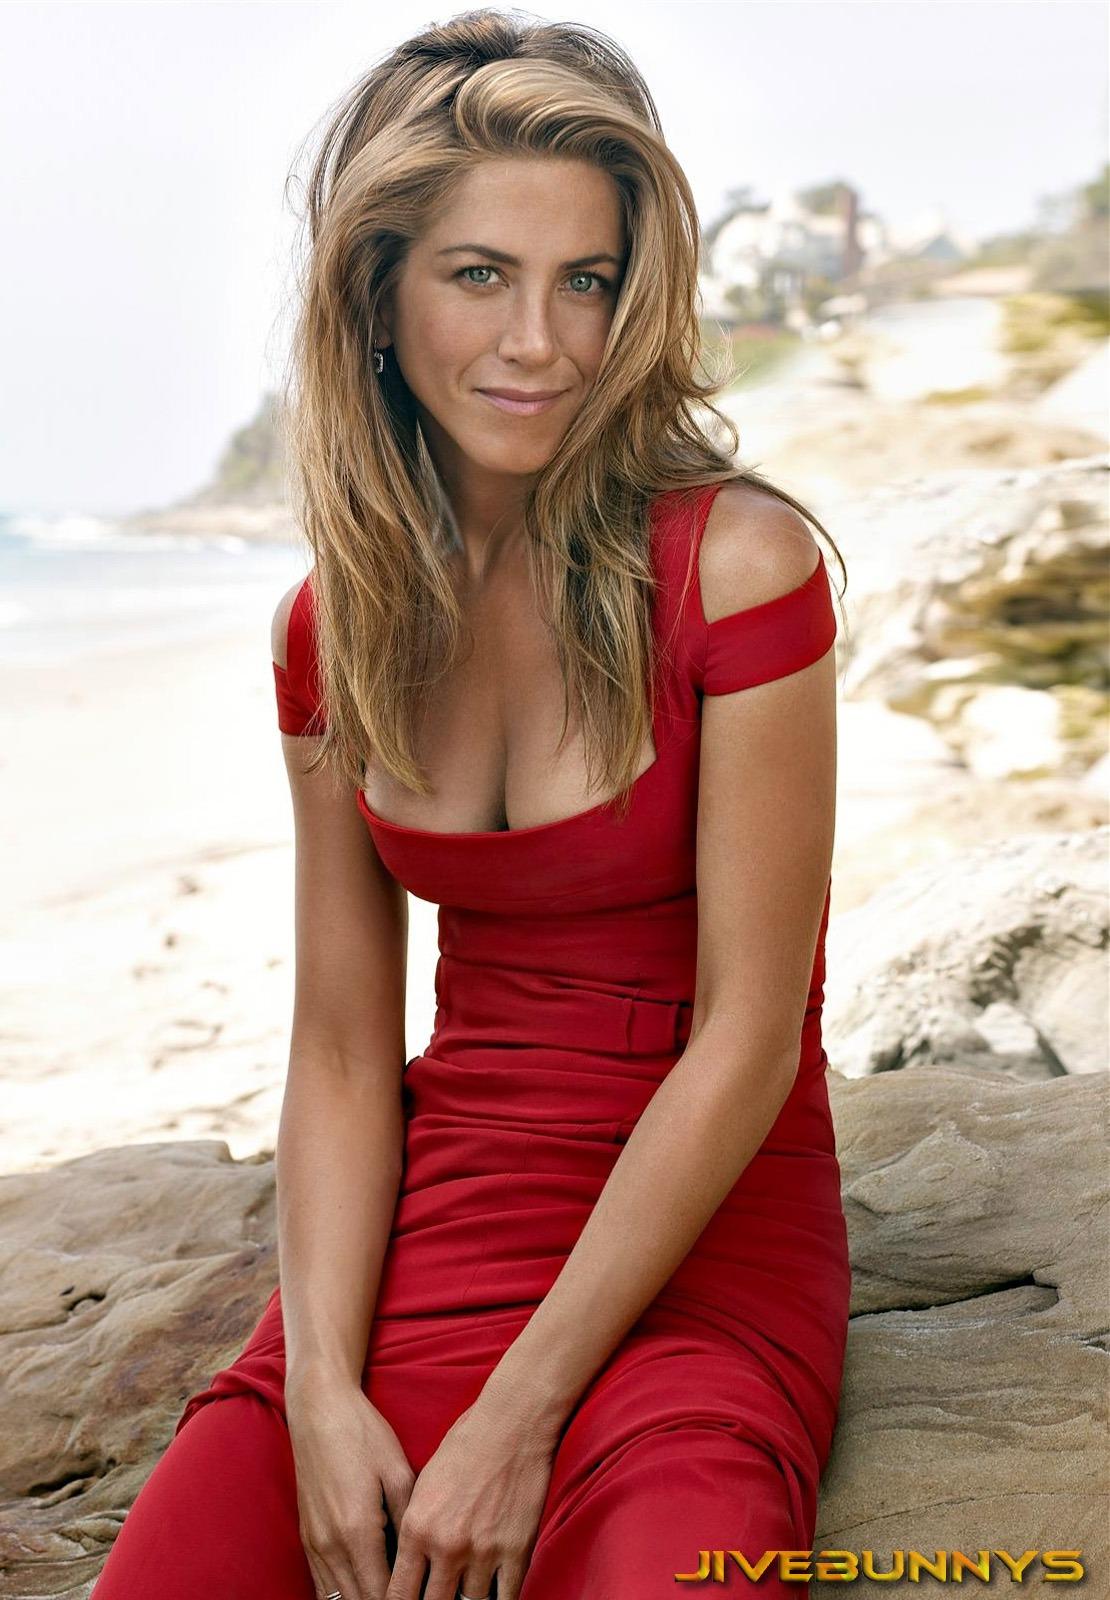 jennifer aniston celebrity actress - photo #30